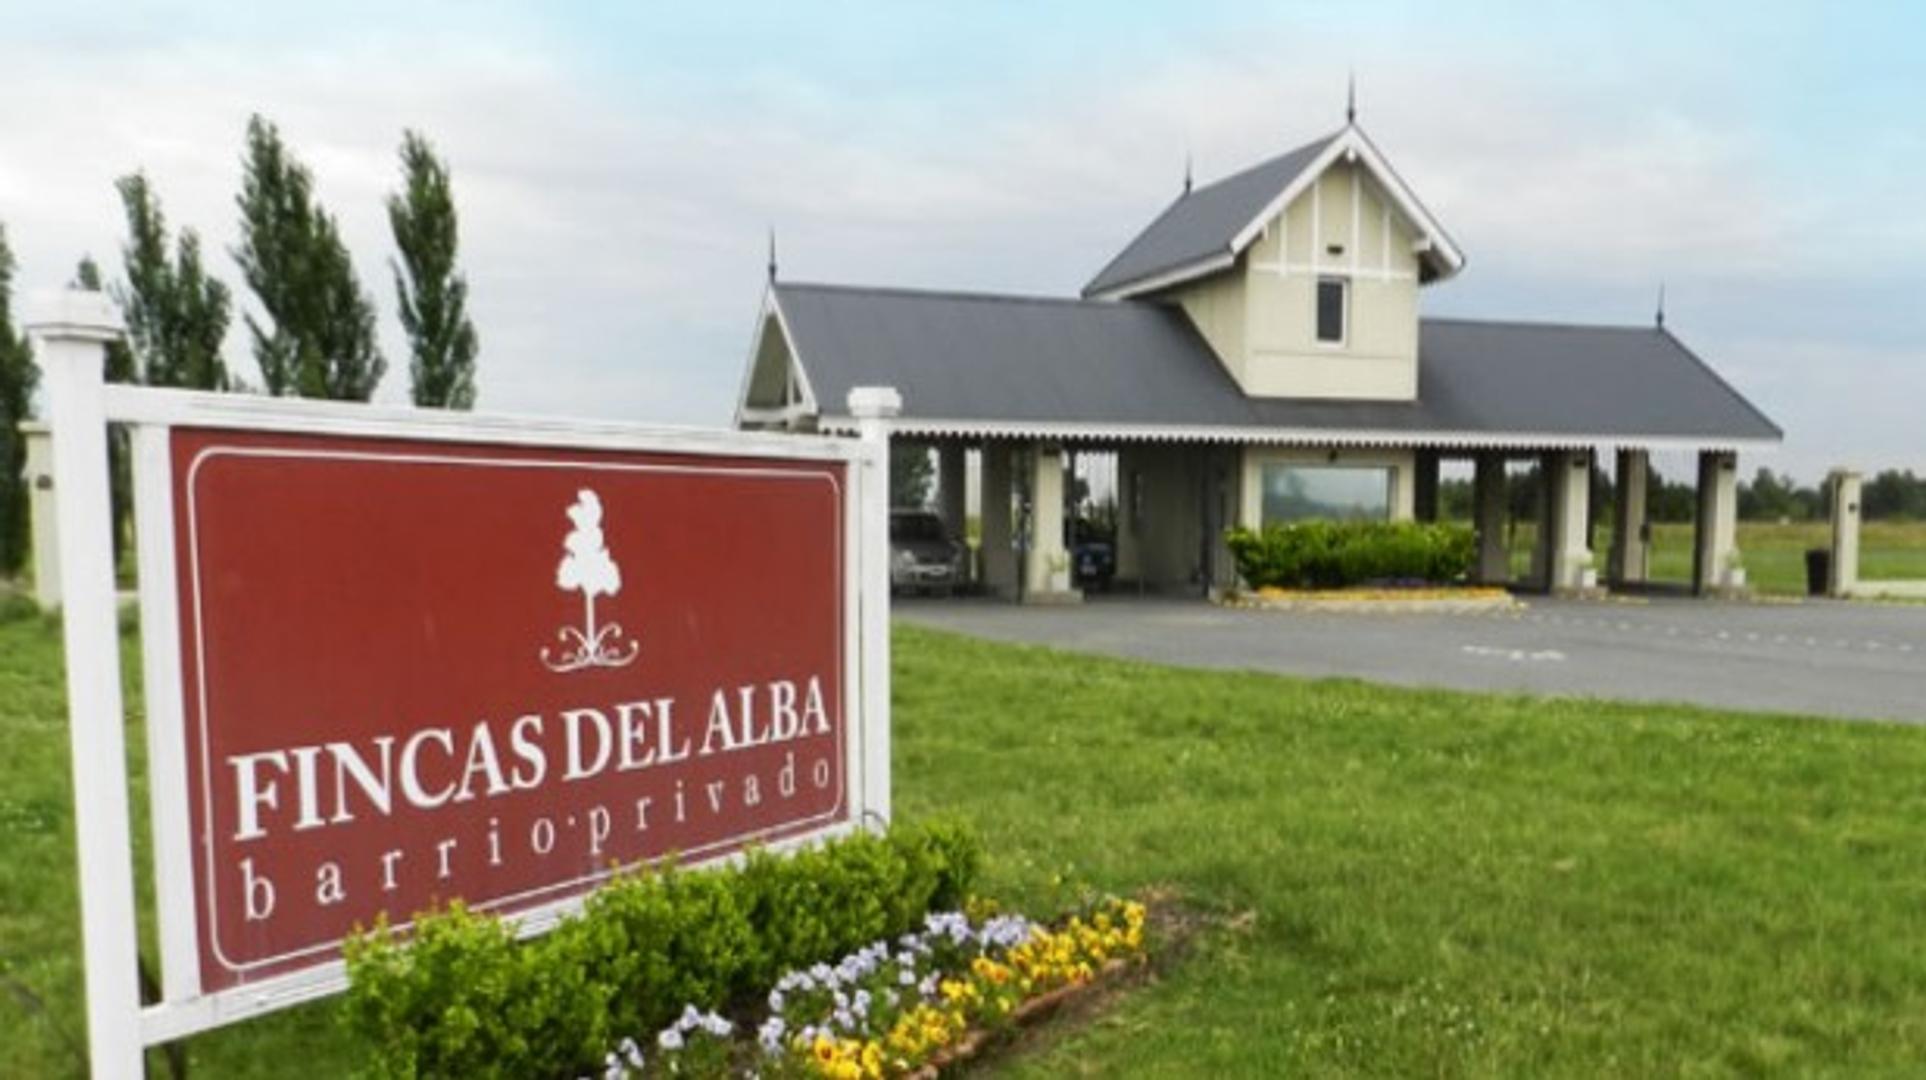 FINCAS DEL ALBA - TERRENO 2521 m2